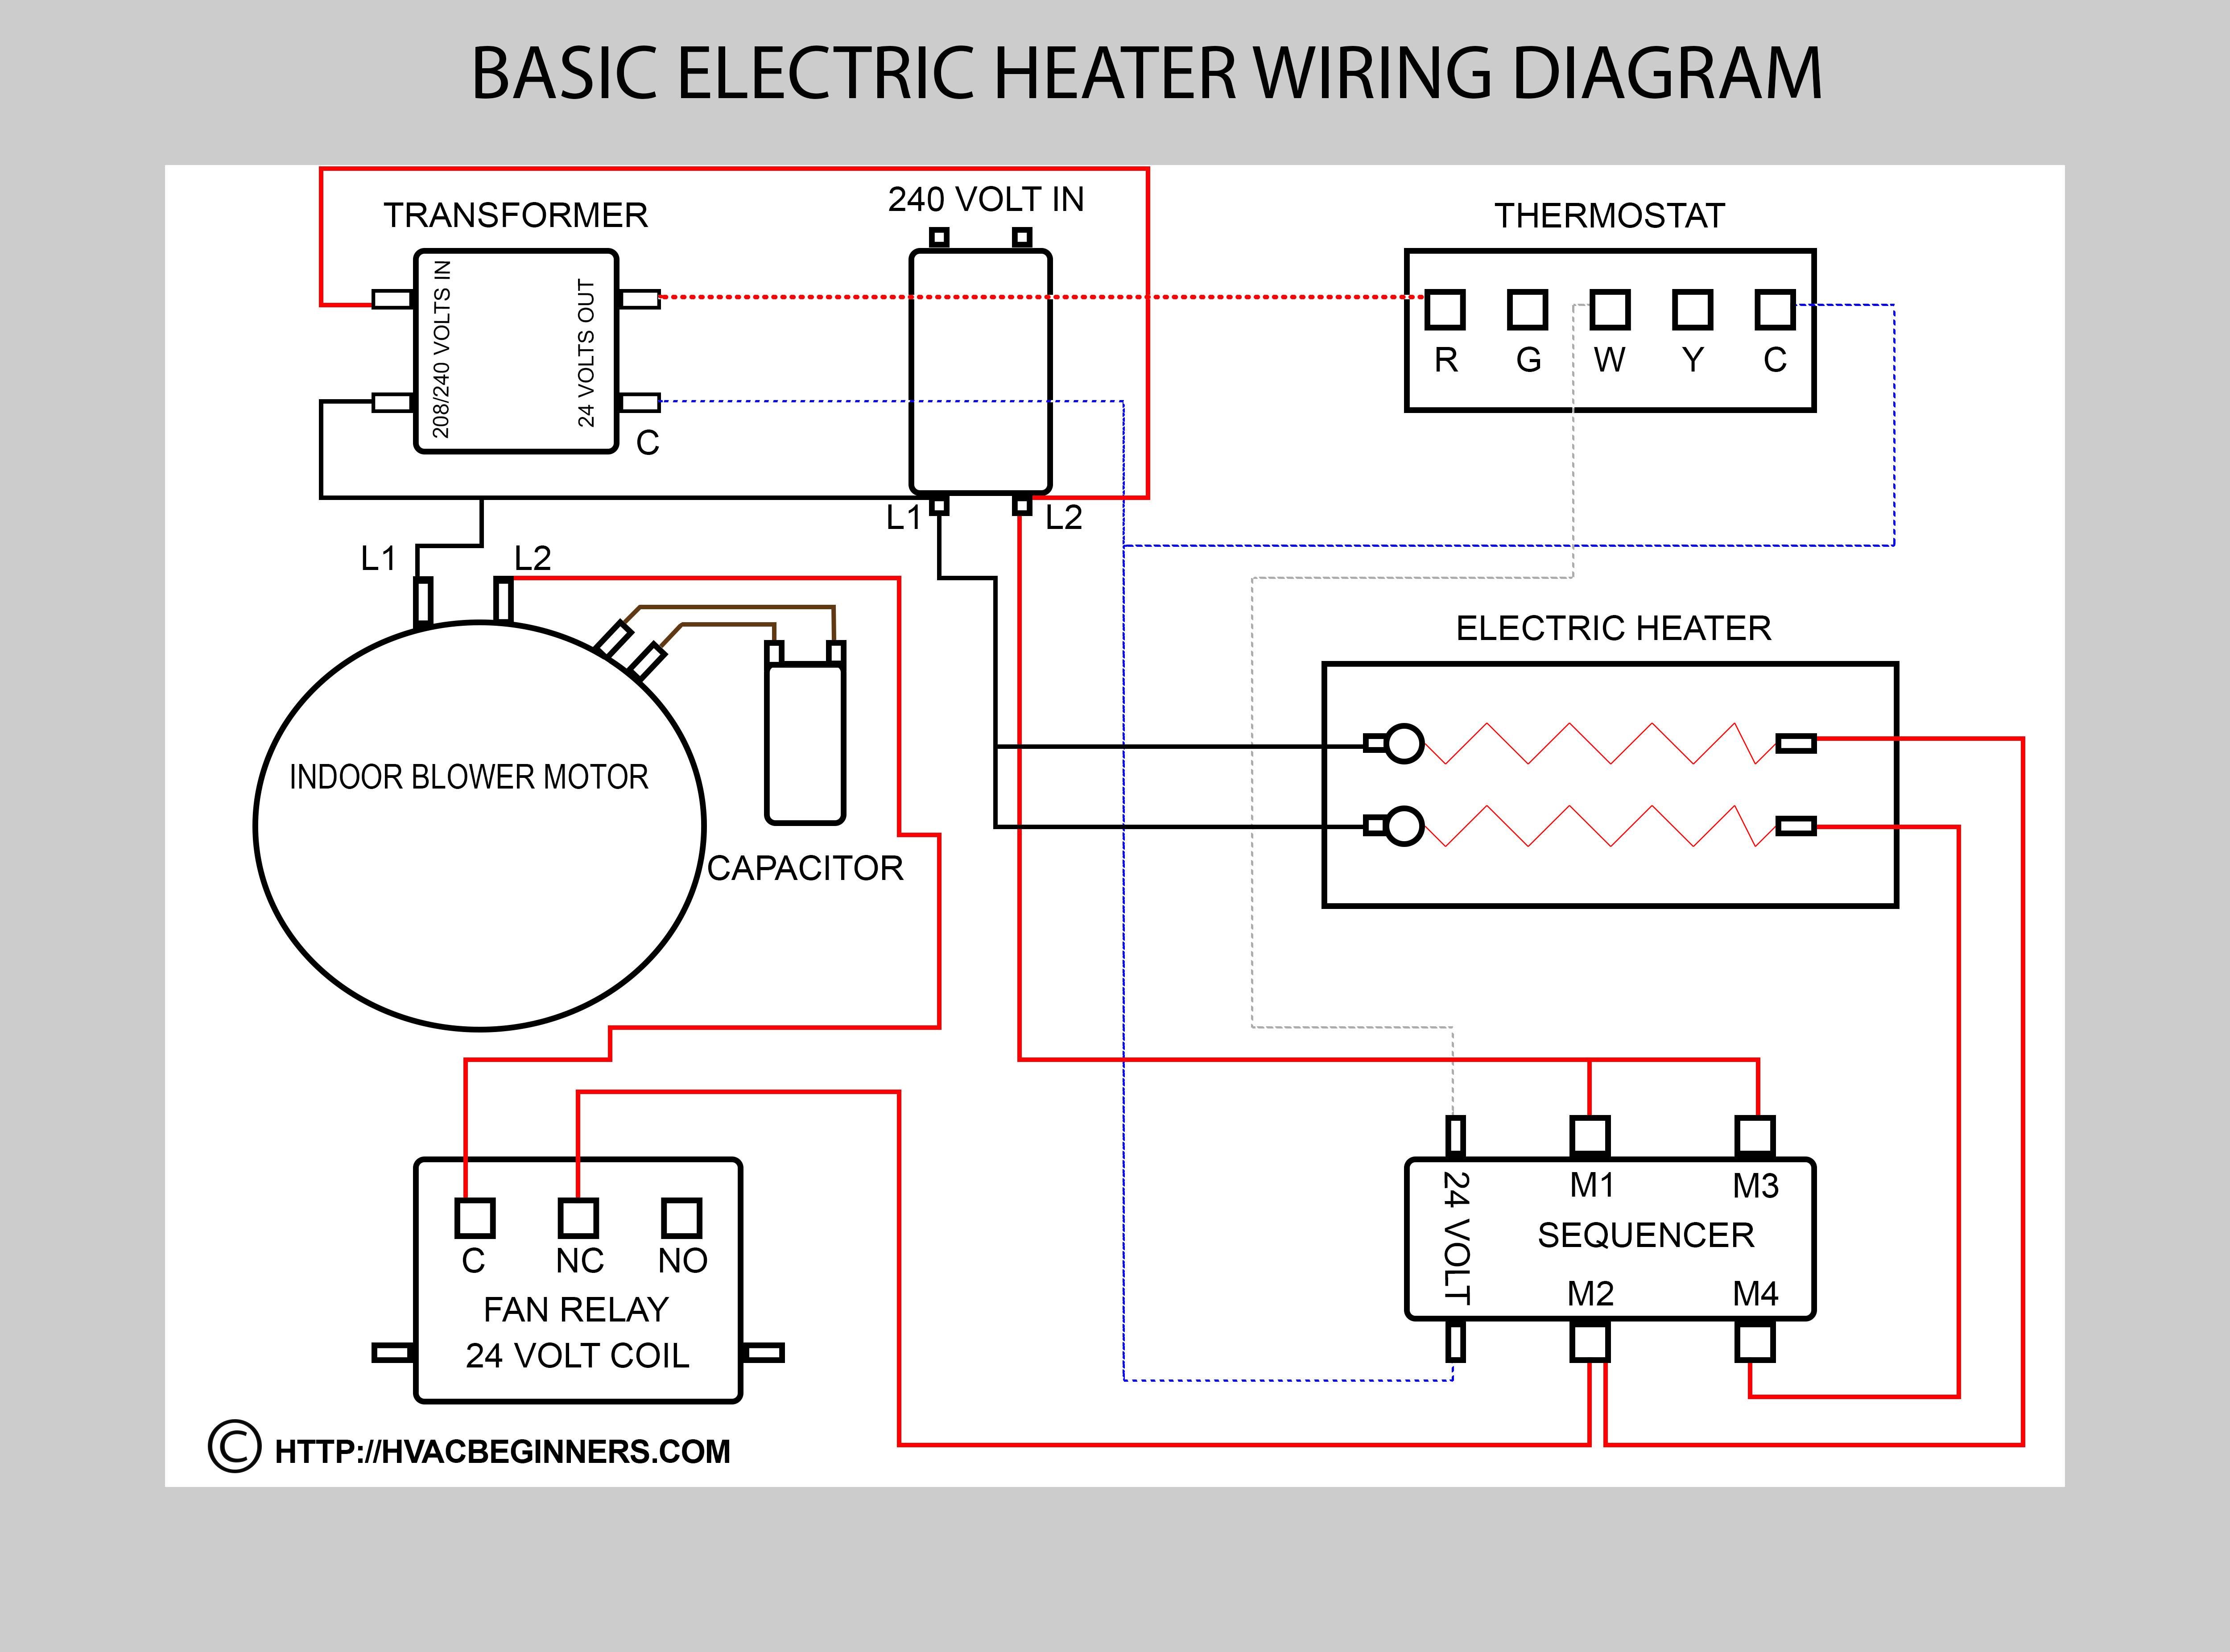 Stark Pool Pump Wiring Diagram Inspirational 2 Speed Pool Pump - Pool Pump Wiring Diagram